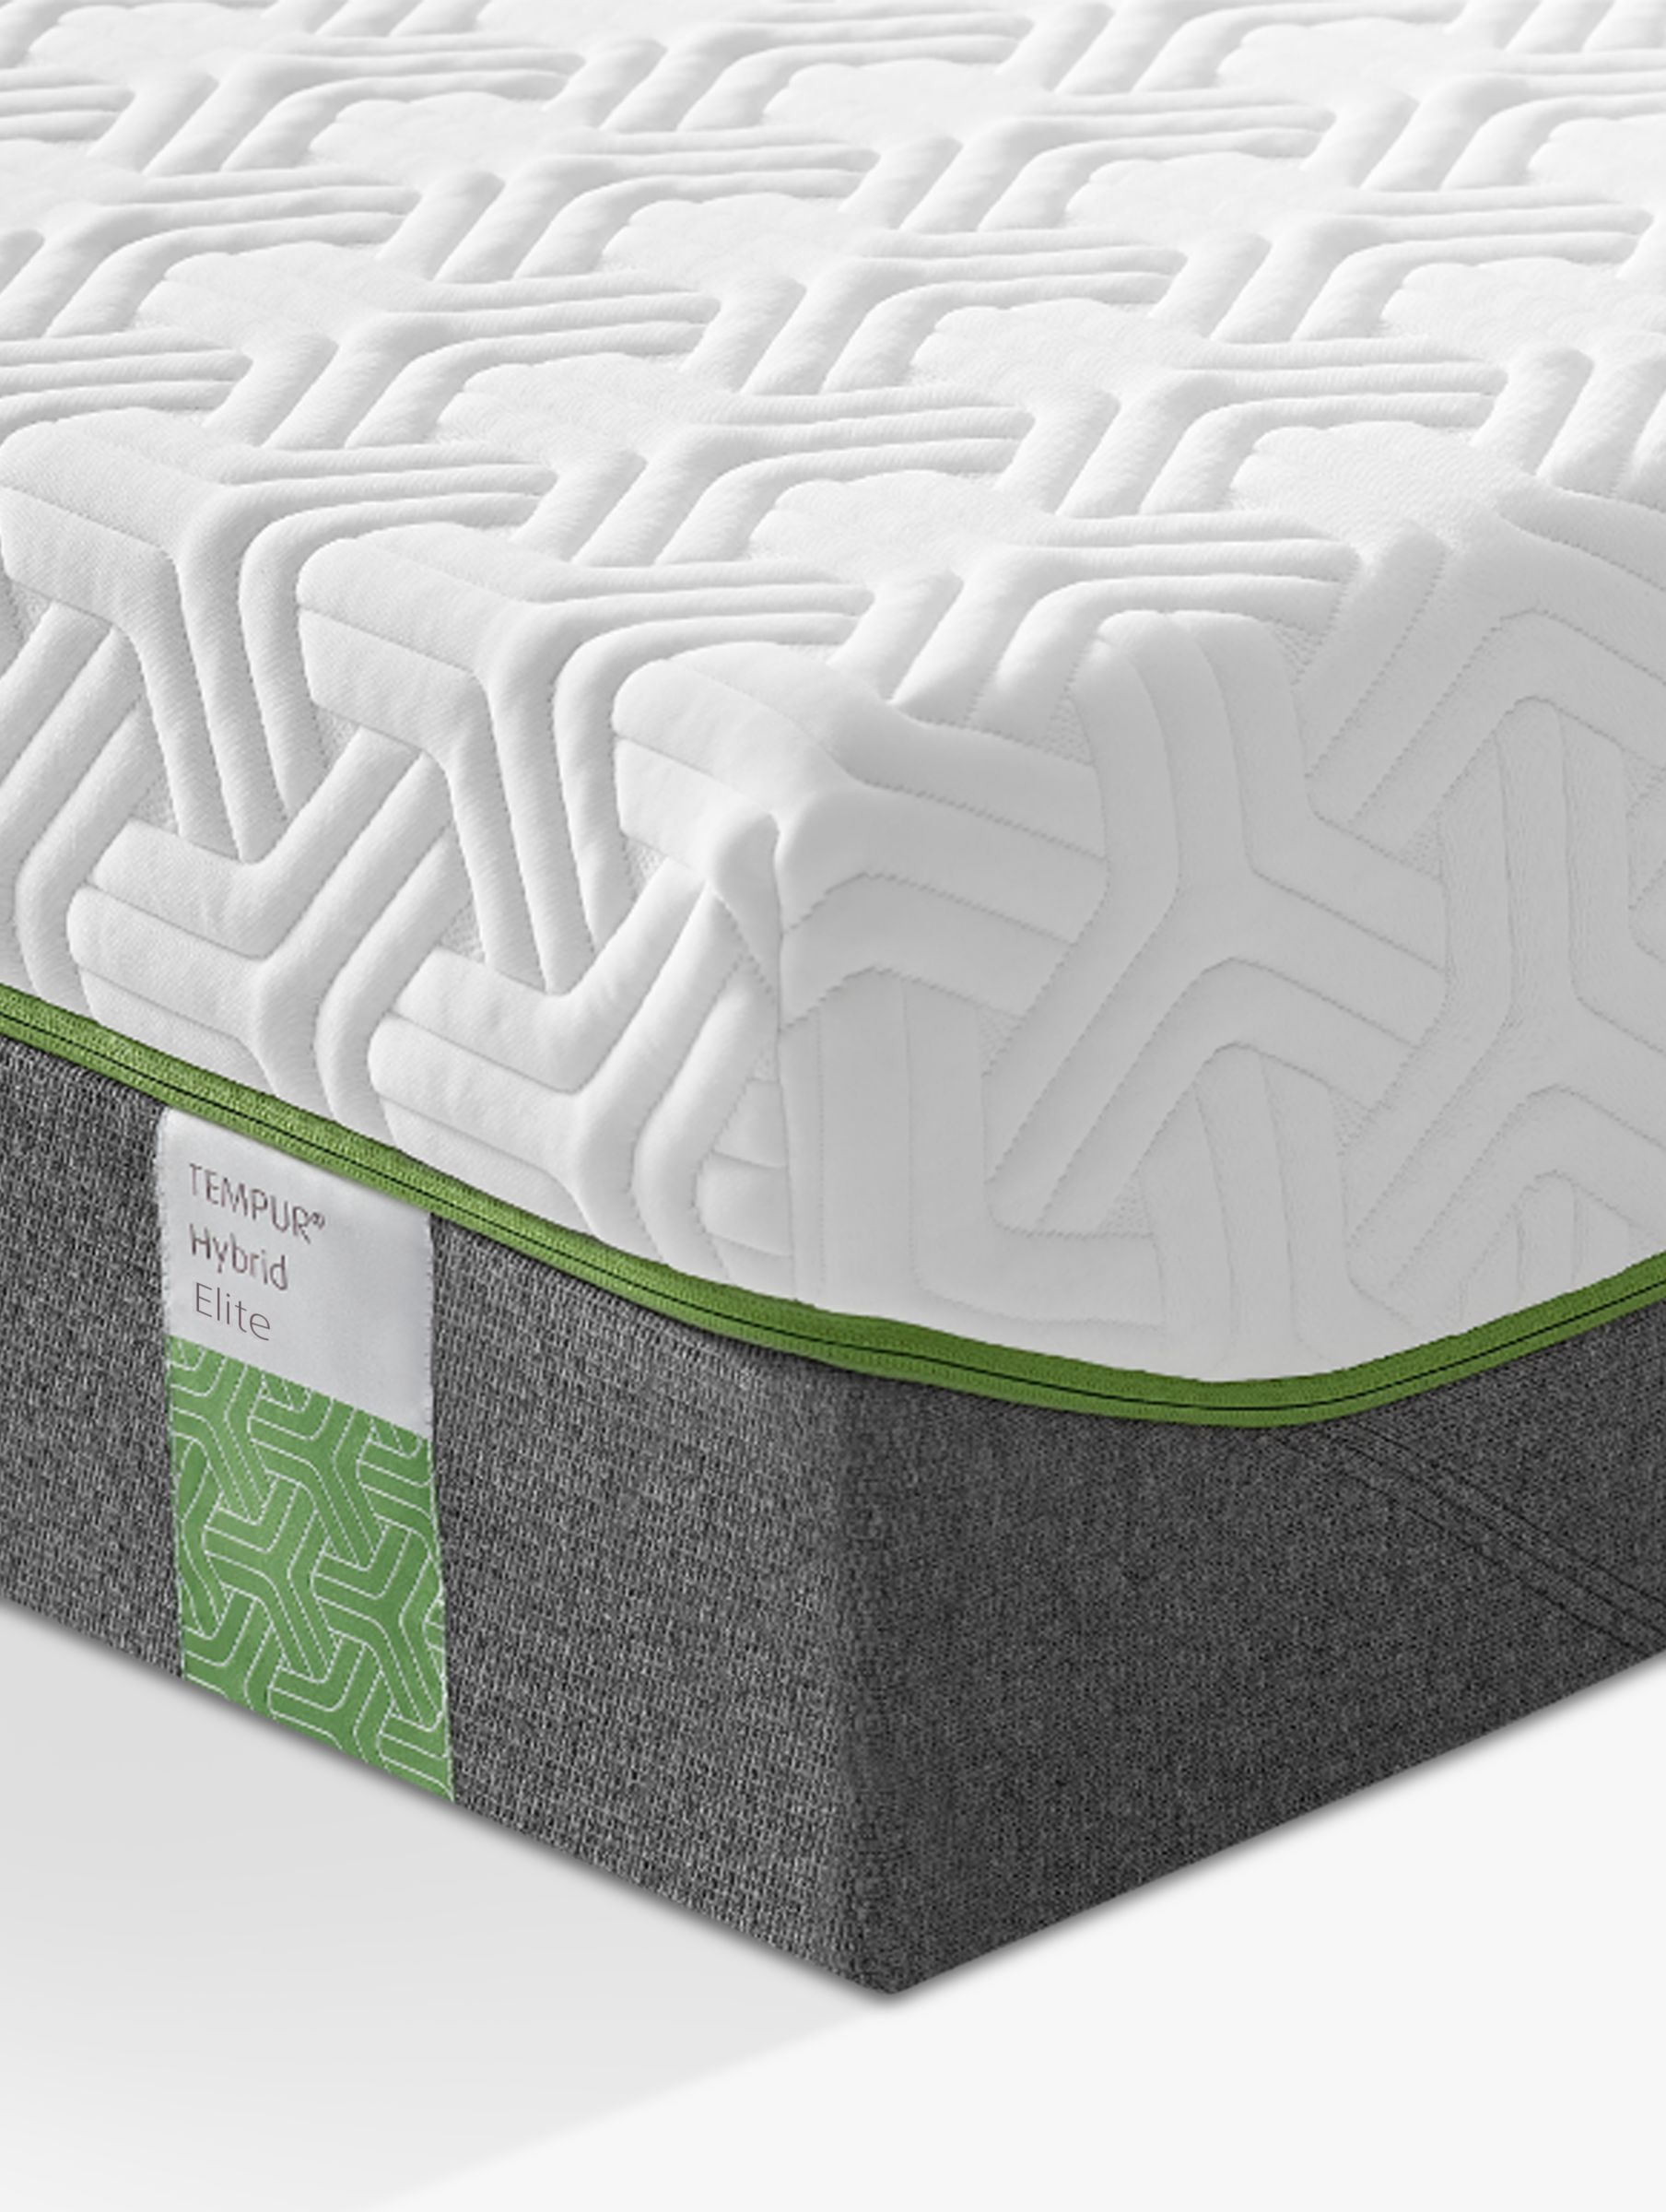 Tempur Tempur Hybrid Elite Pocket Spring Memory Foam Mattress, Double